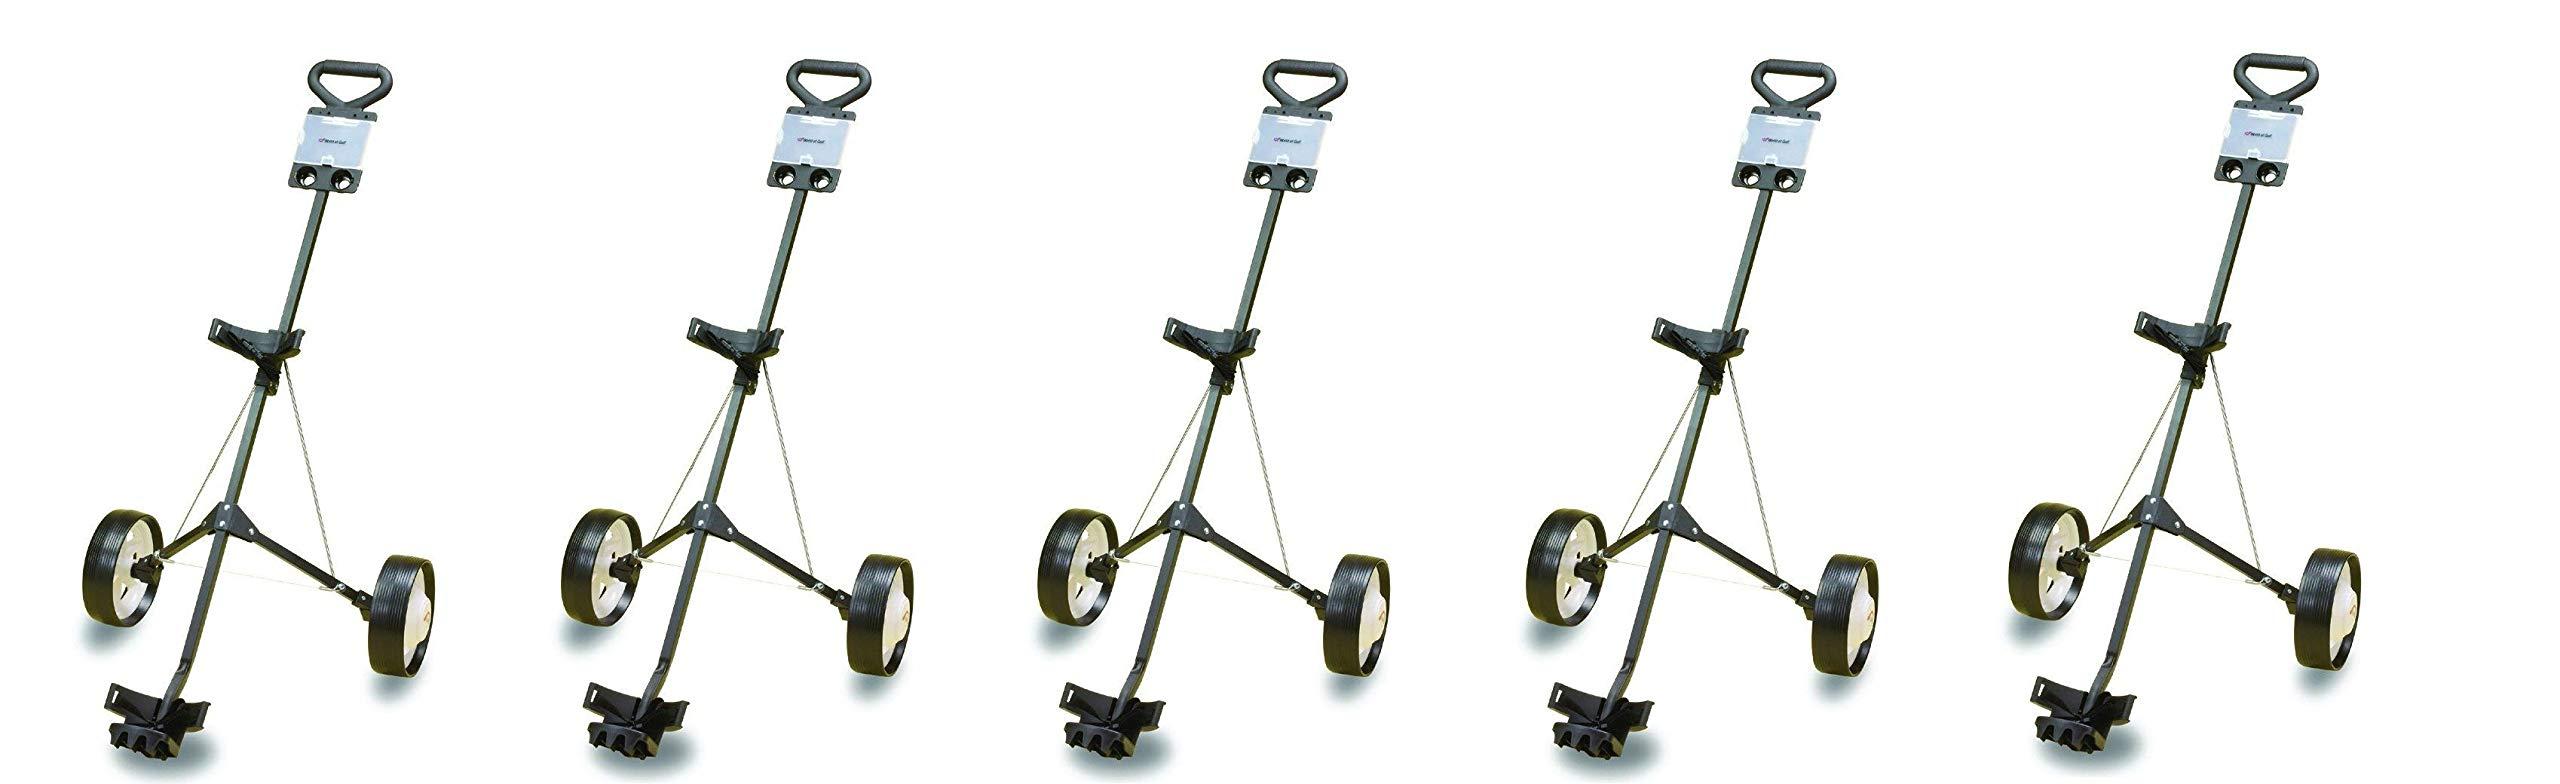 JEF WORLD OF GOLF Deluxe Steel Golf Cart (5-Pack)